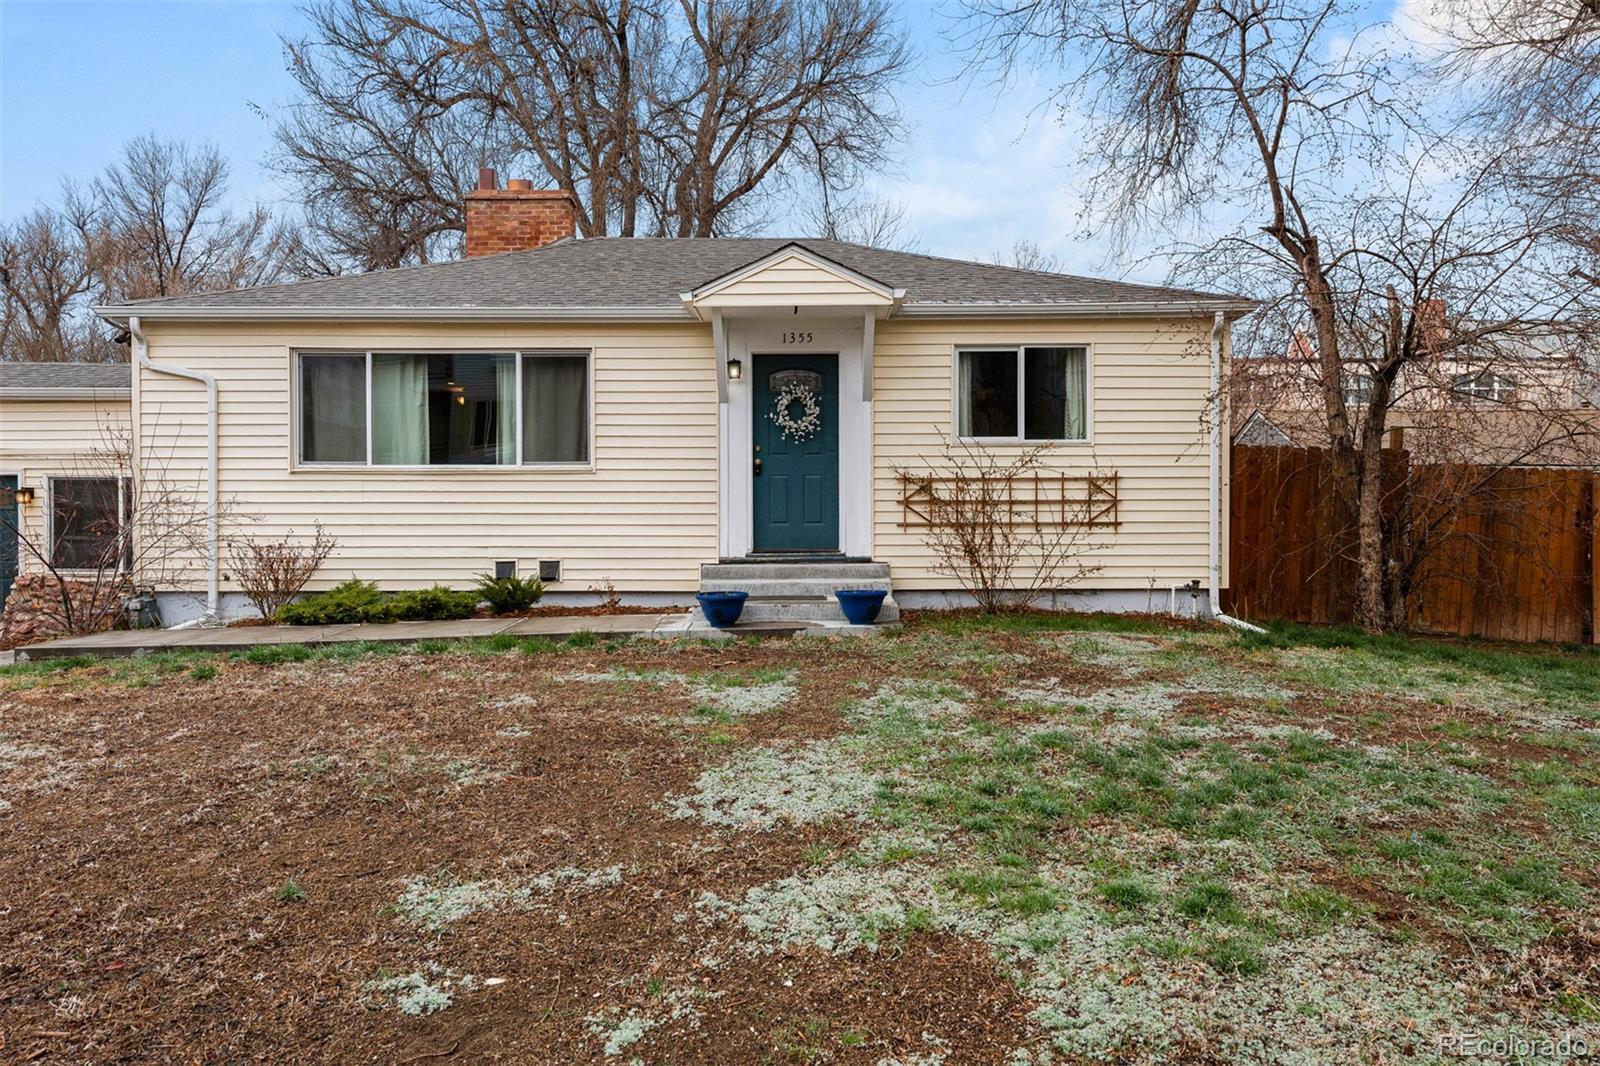 1355 Allison Street, Lakewood, CO 80214 - Lakewood, CO real estate listing